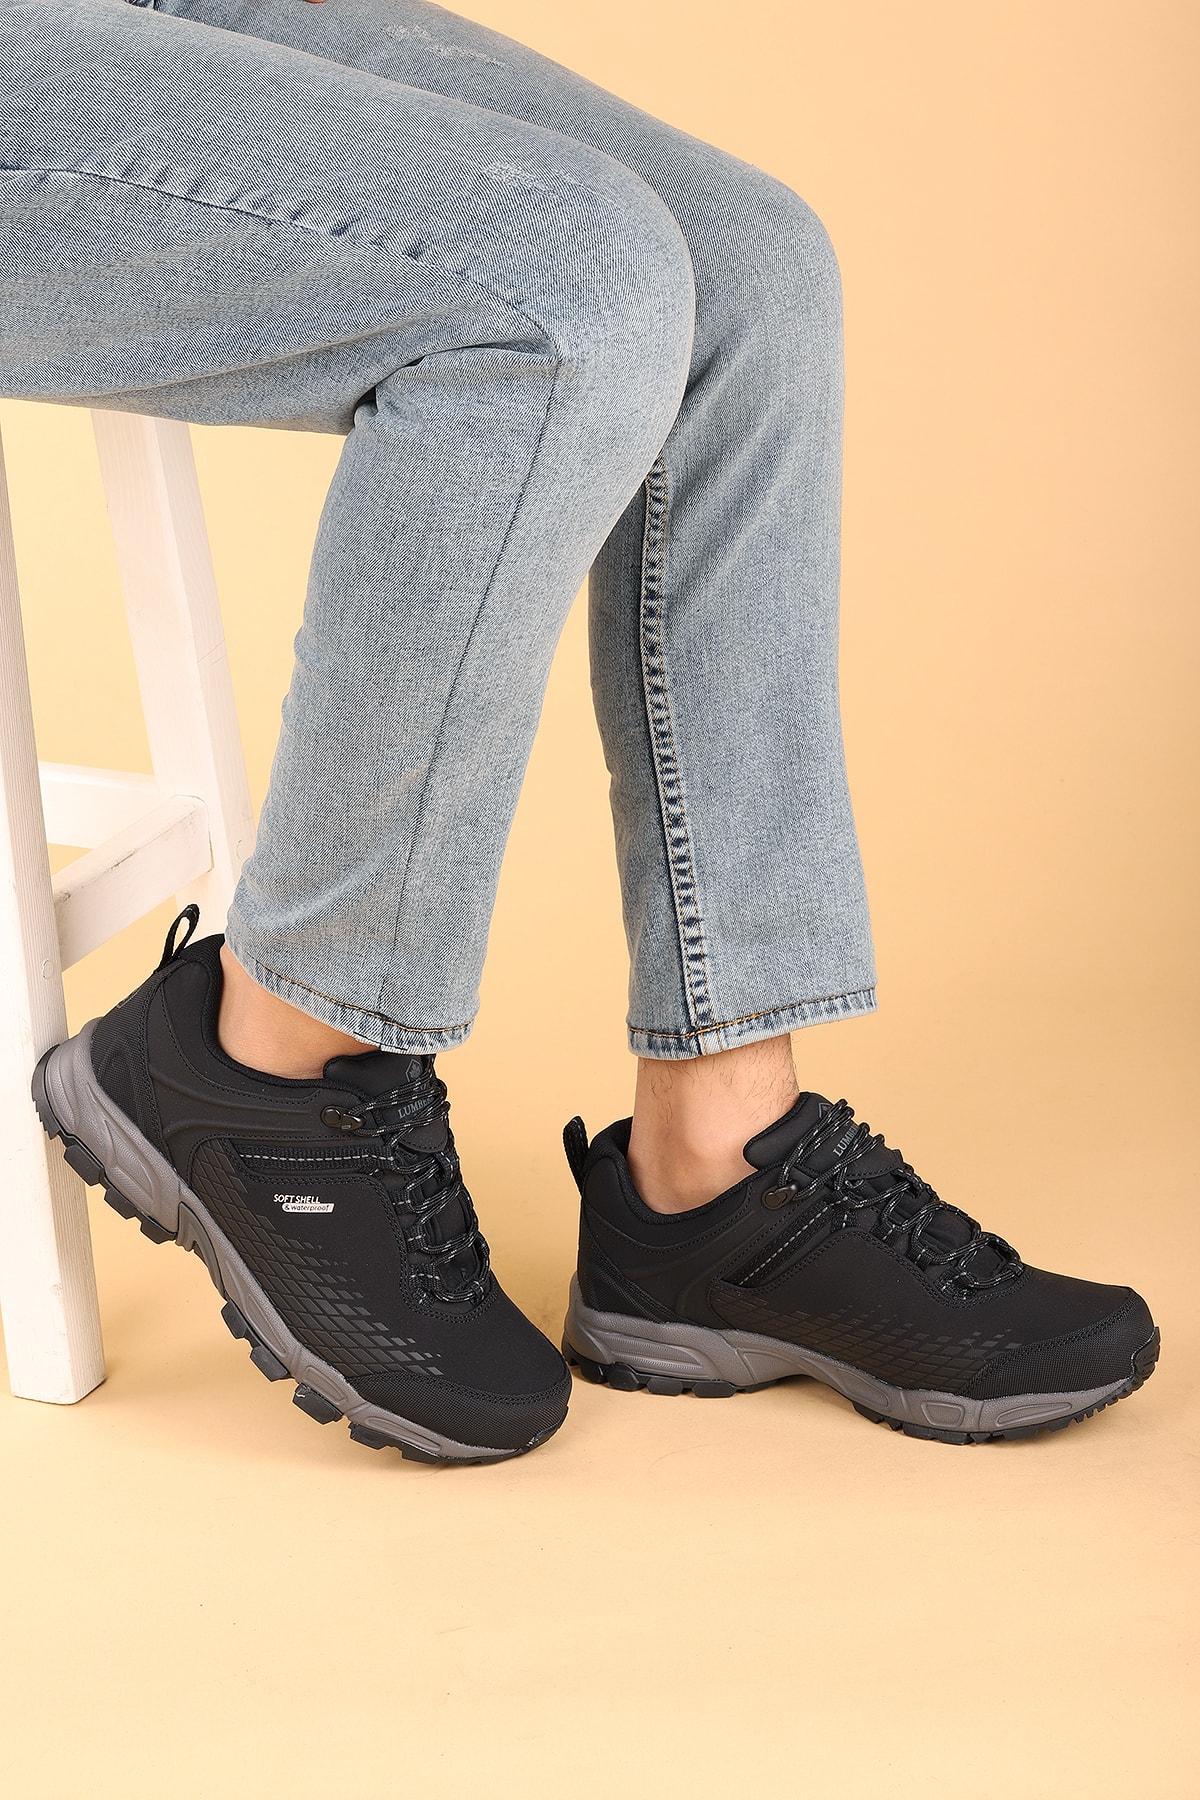 lumberjack Erkek Siyah Bot Ayakkabı Flake Su Geçirmez 2